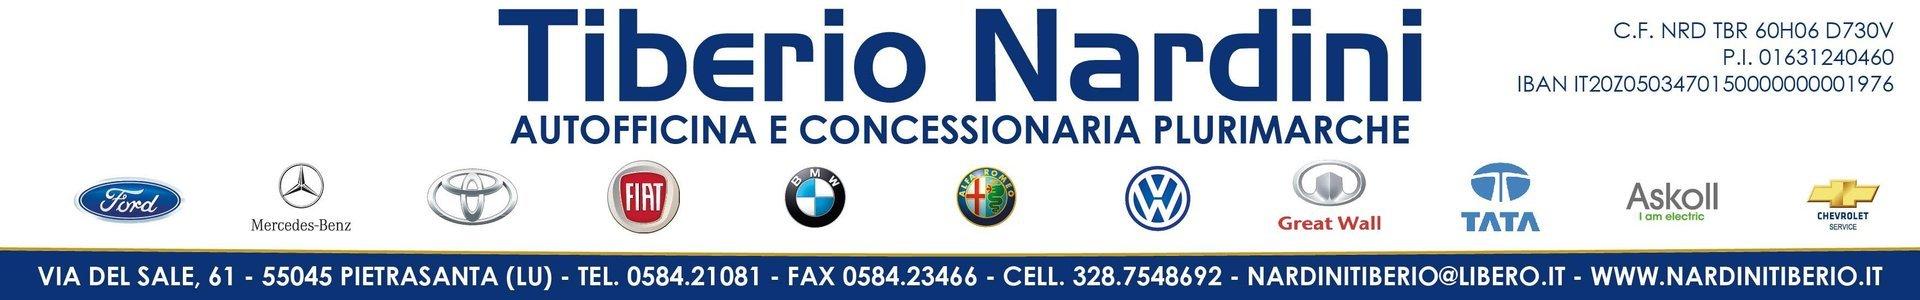 Tiberio Nardini - logo